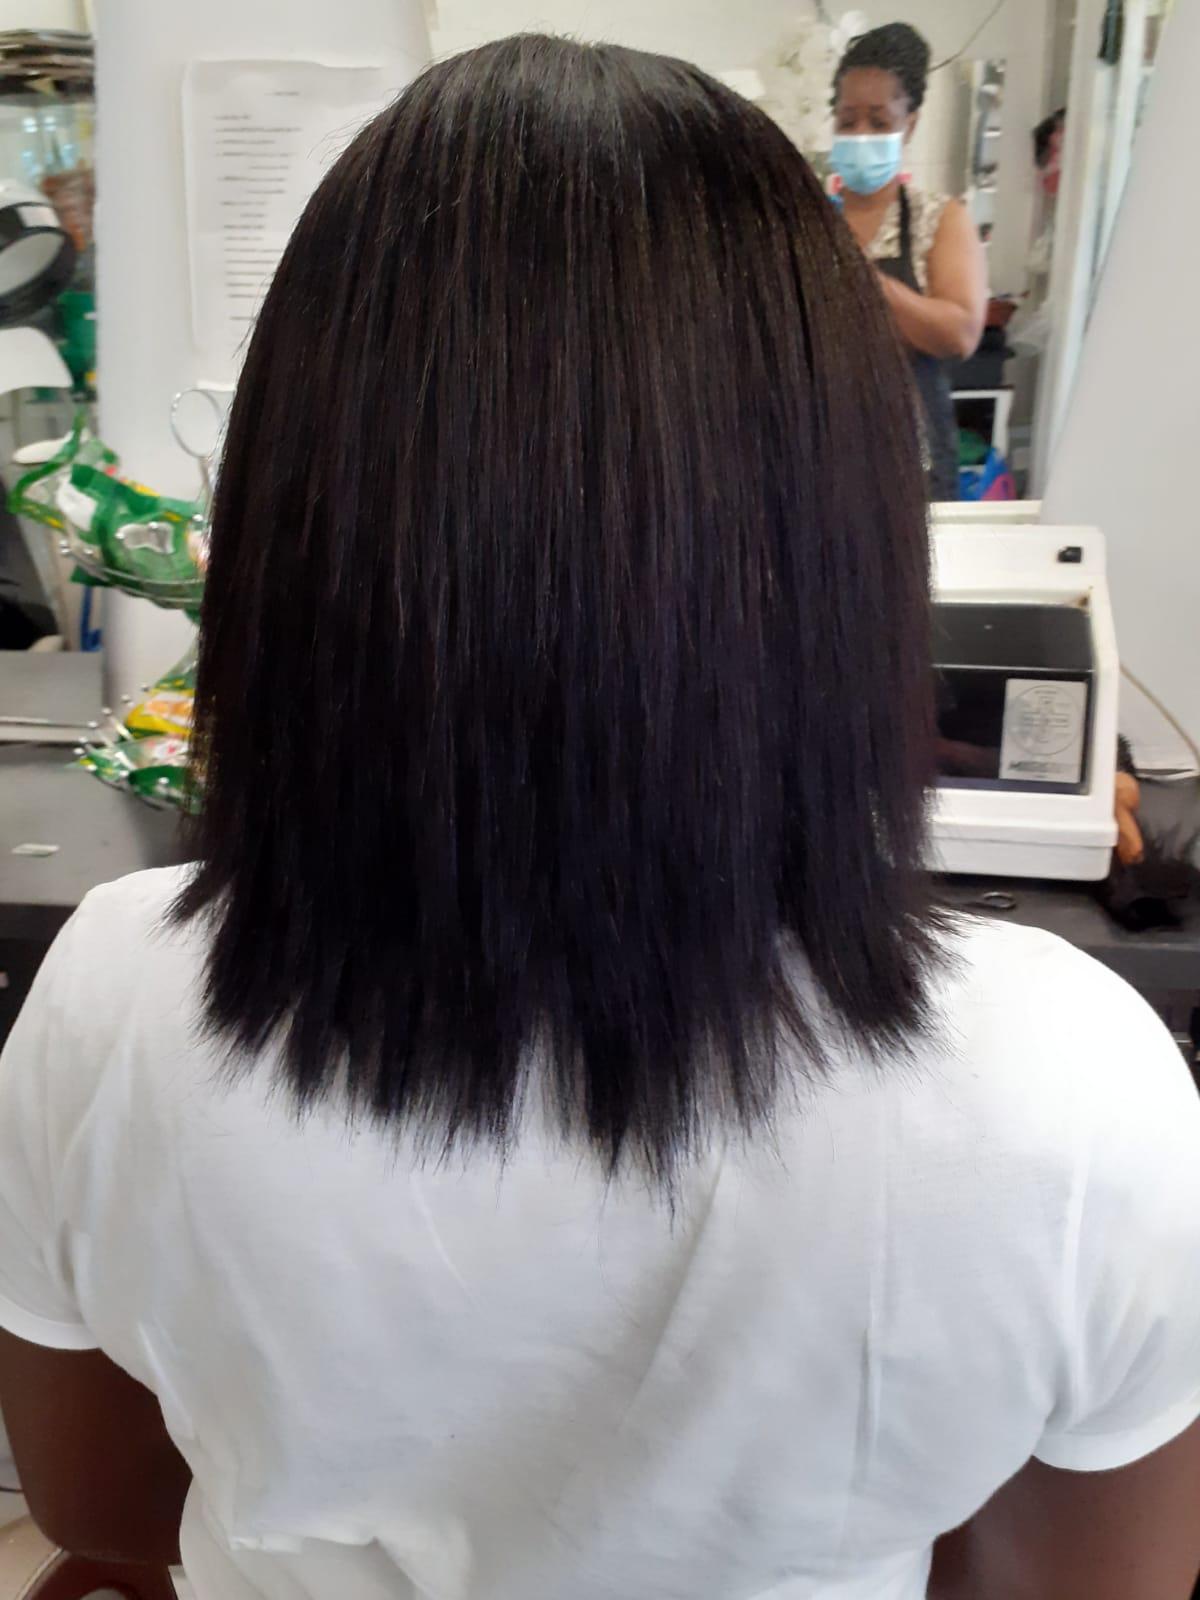 salon de coiffure afro tresse tresses box braids crochet braids vanilles tissages paris 75 77 78 91 92 93 94 95 RNJTNYAQ